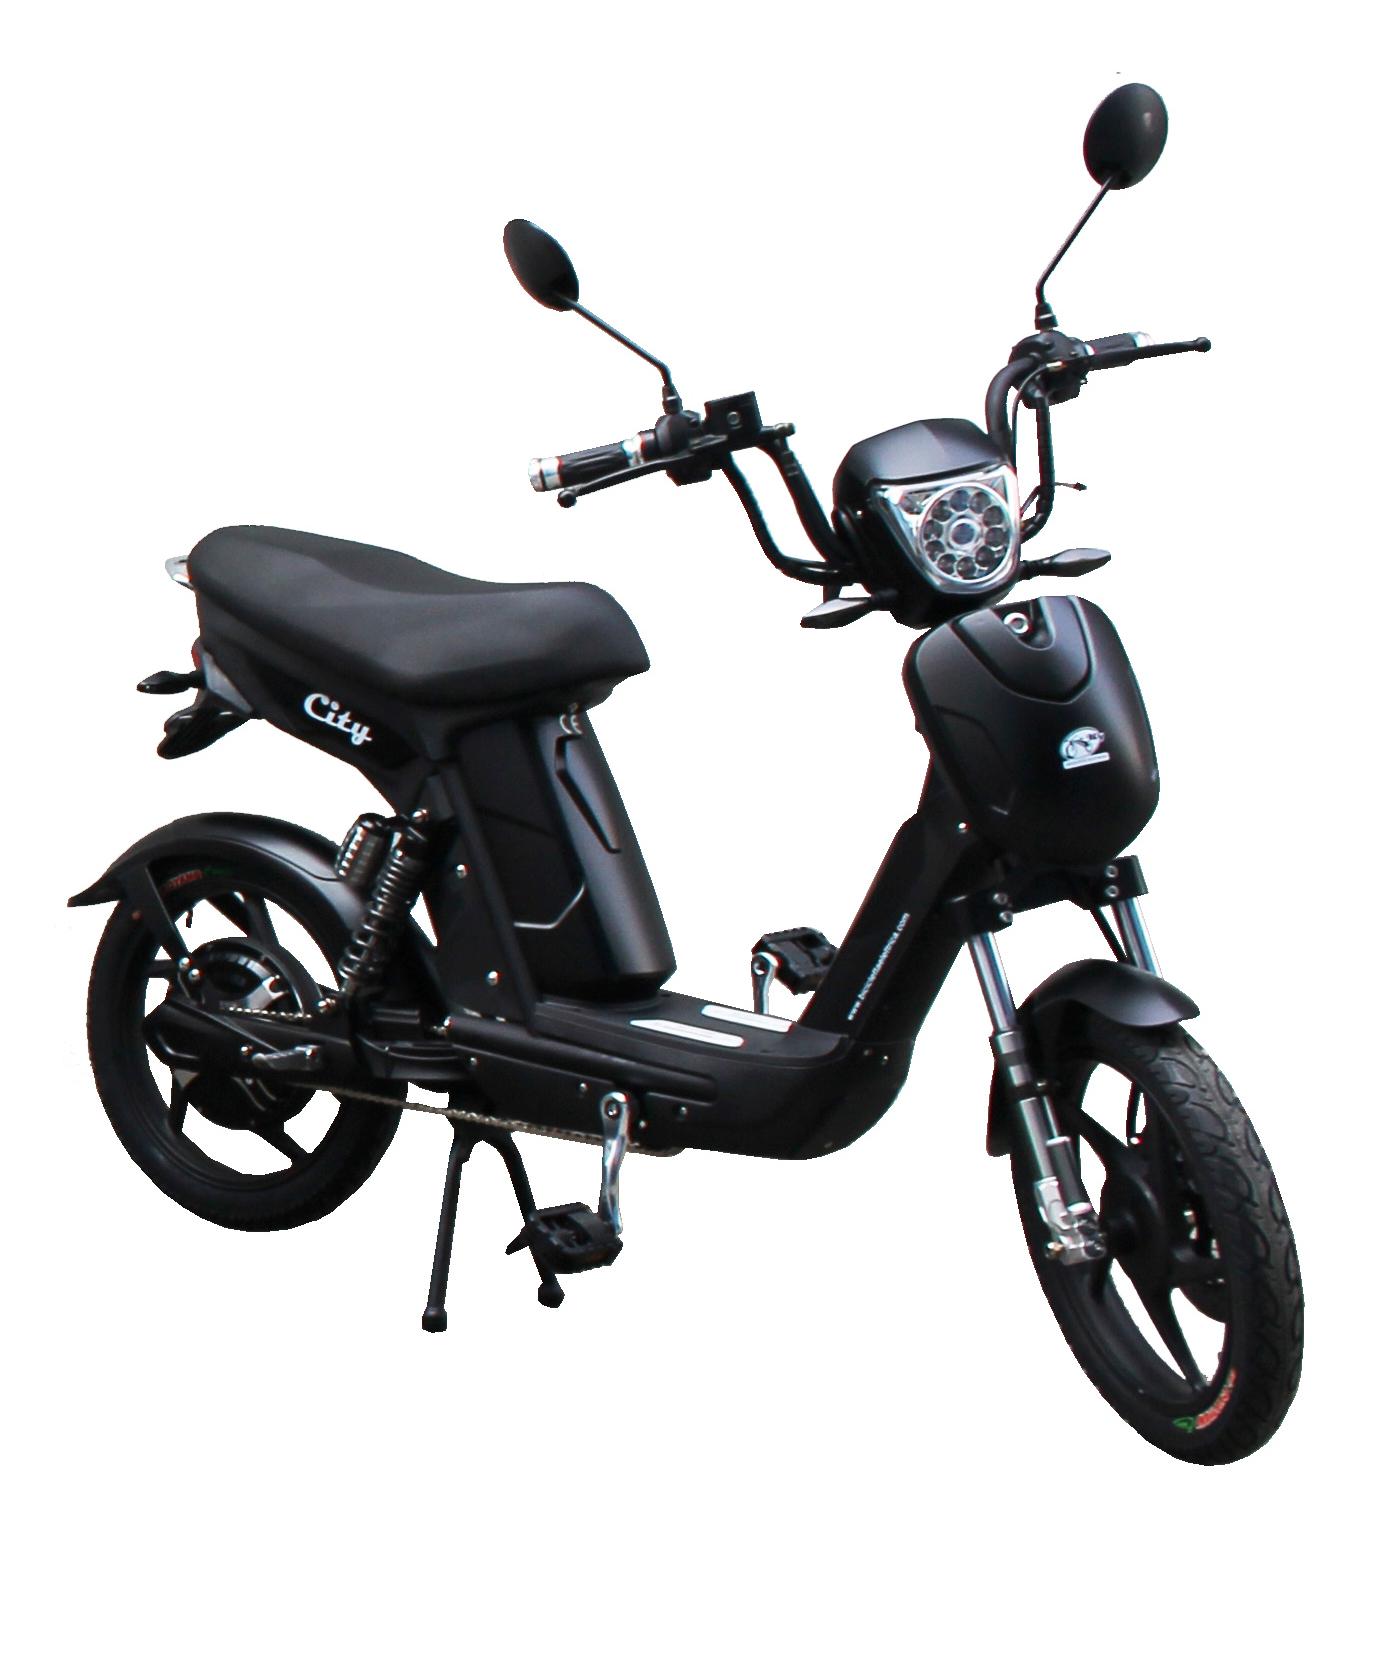 Bici E-Bike / E-Fahrrad Elektrofahrrad City Lithium-Akku schwarz Bild 1